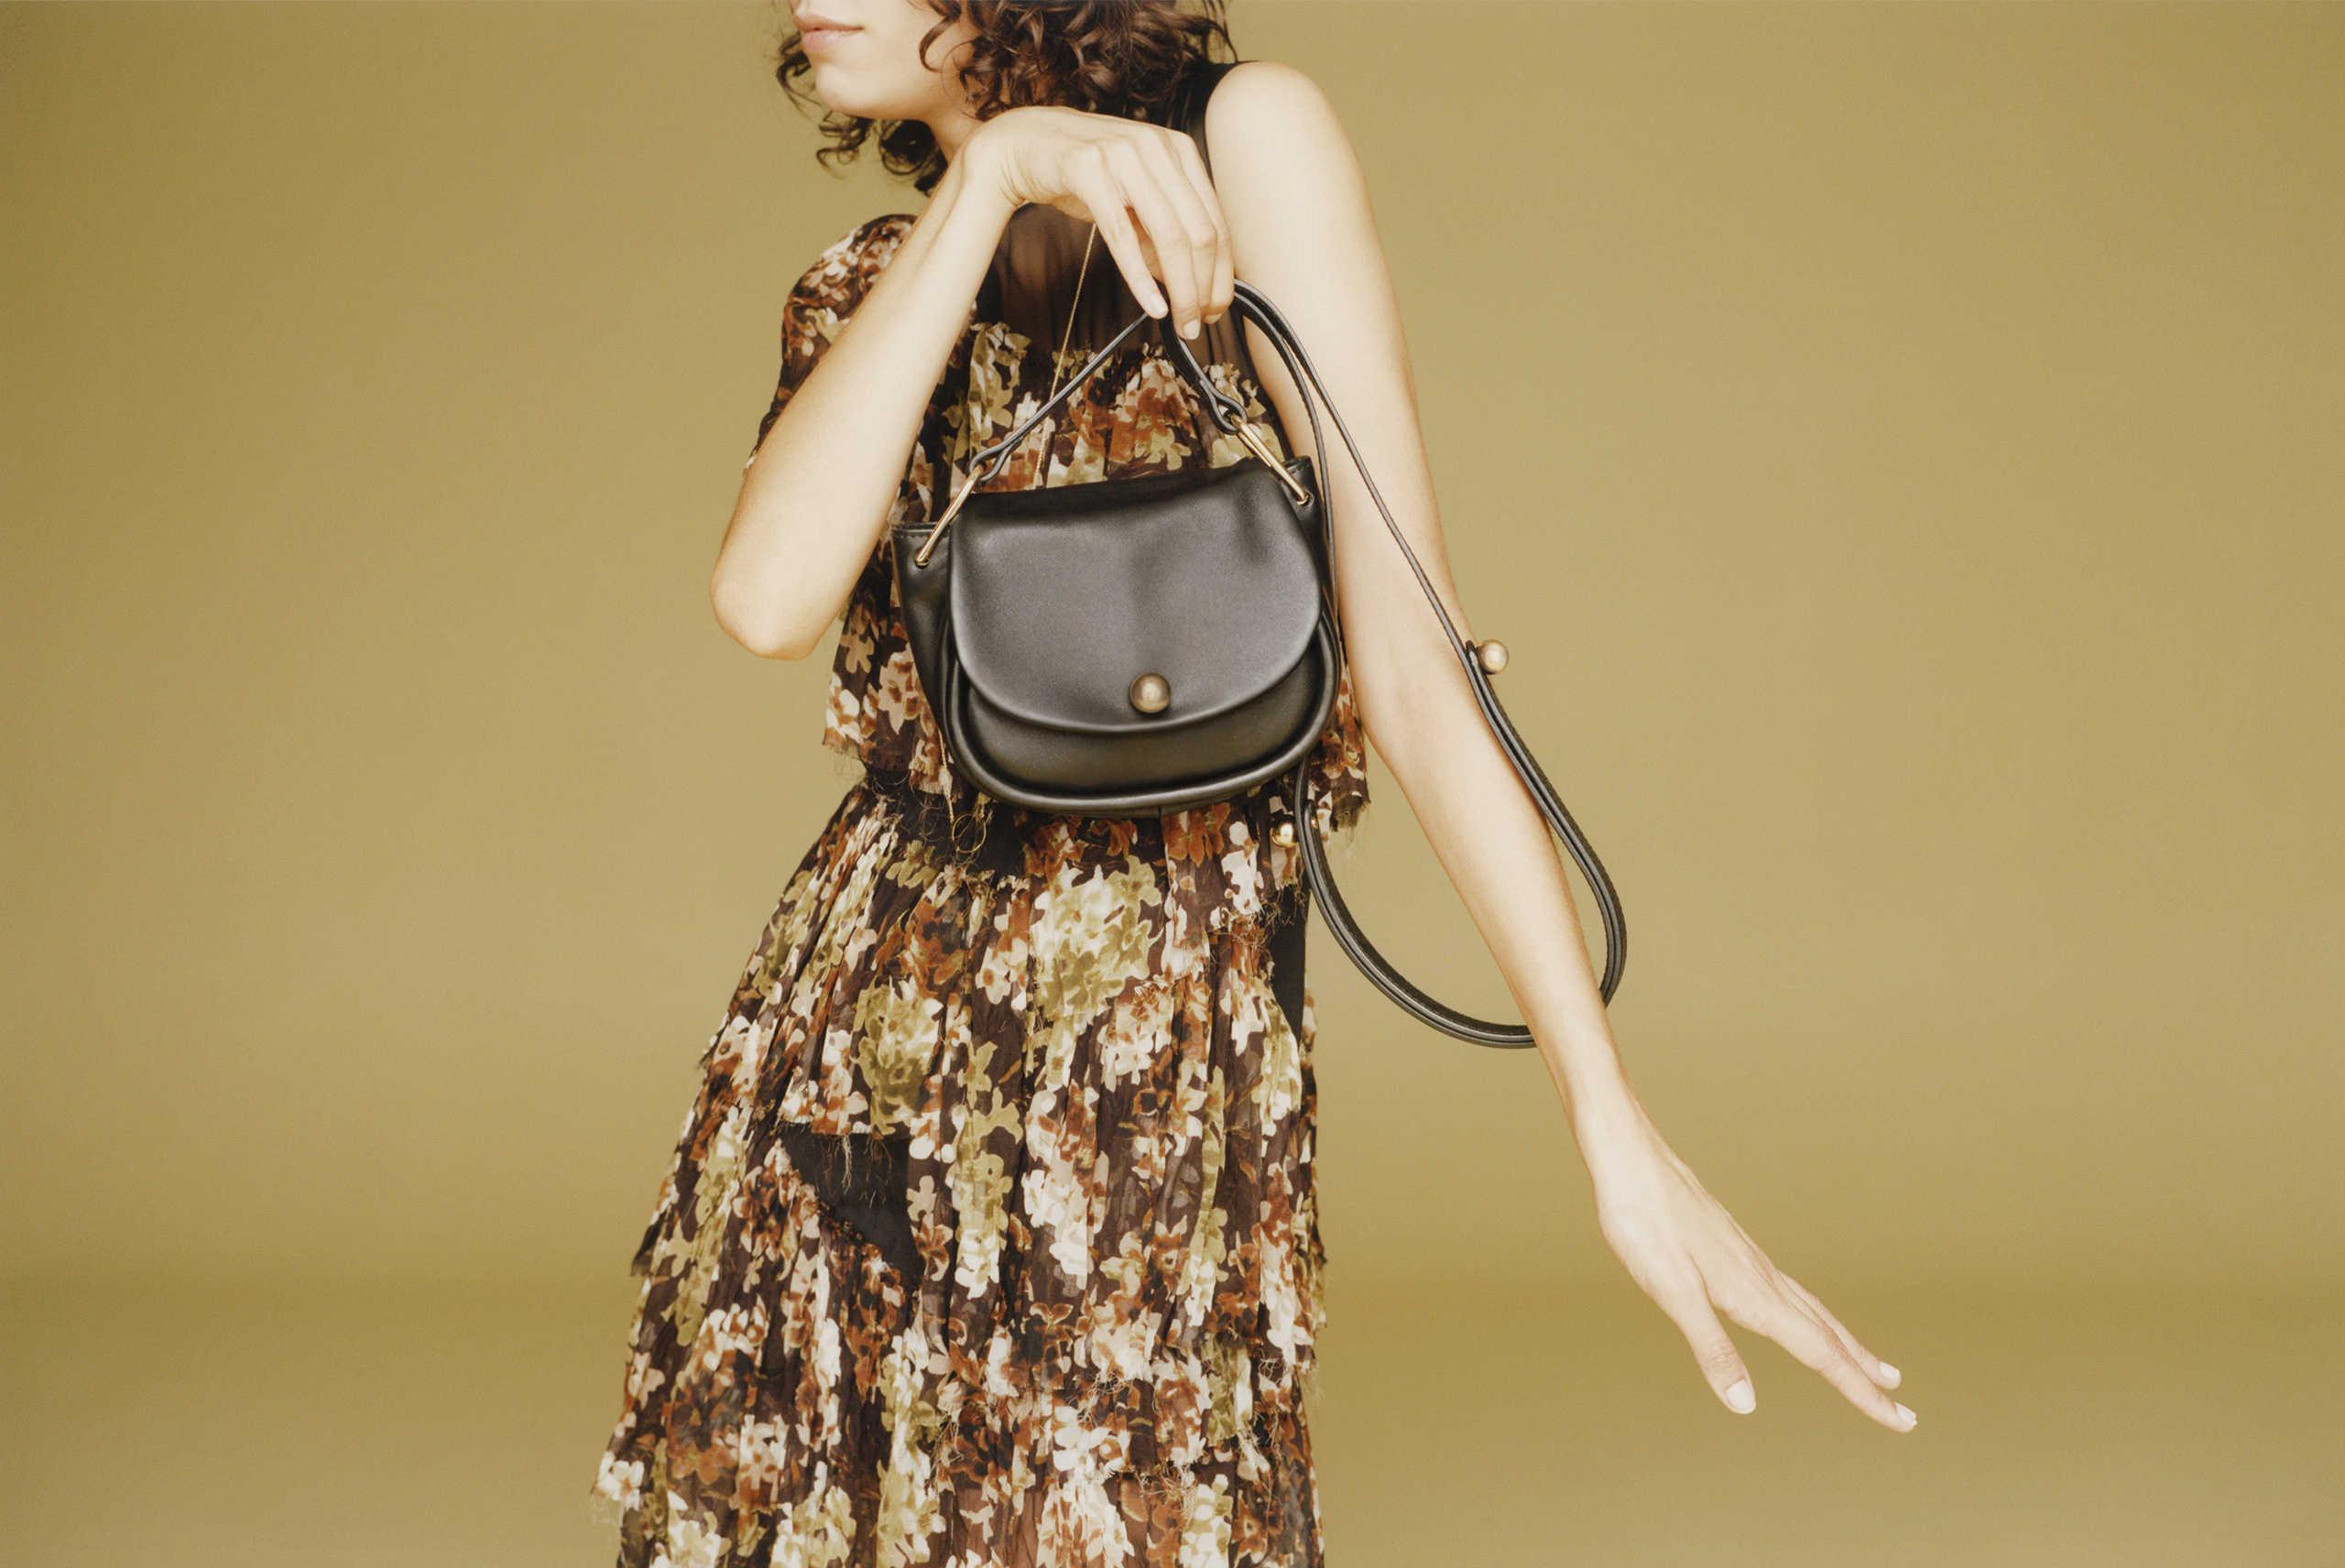 Zara A/W 15-16 Campaign